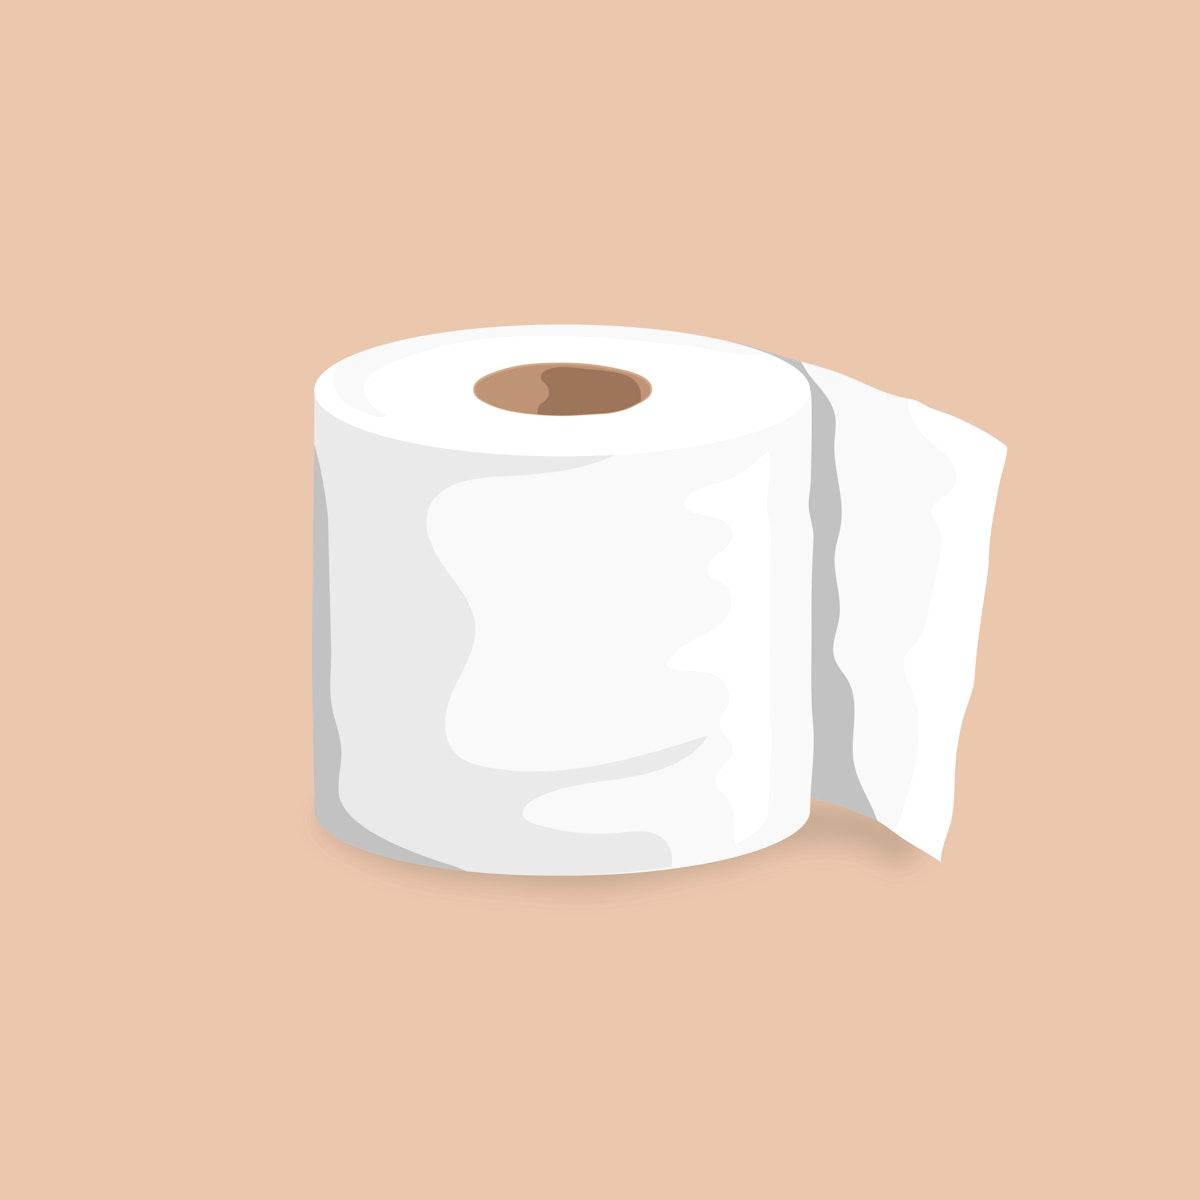 Toilet tissue roll element vector